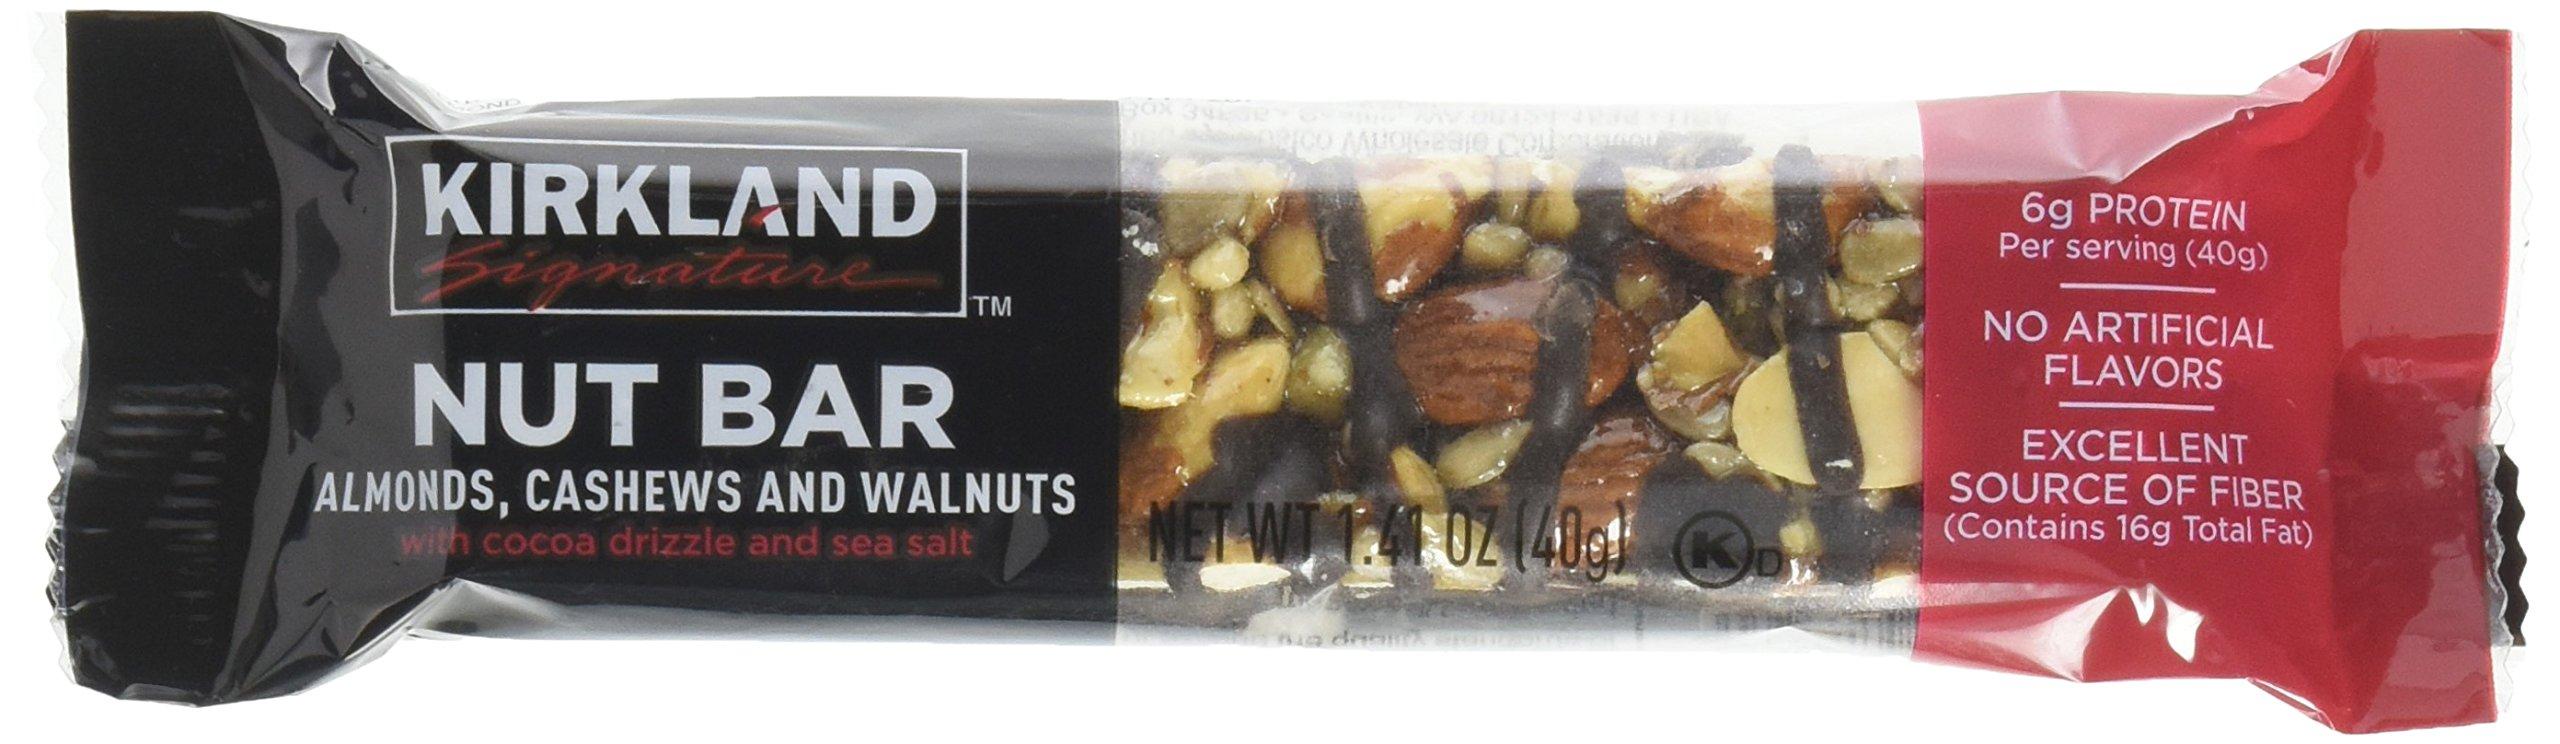 Kirkland Signature Nut Bars 30/1.4 OZ Net Wt 42.3 Oz, 42.3 oz